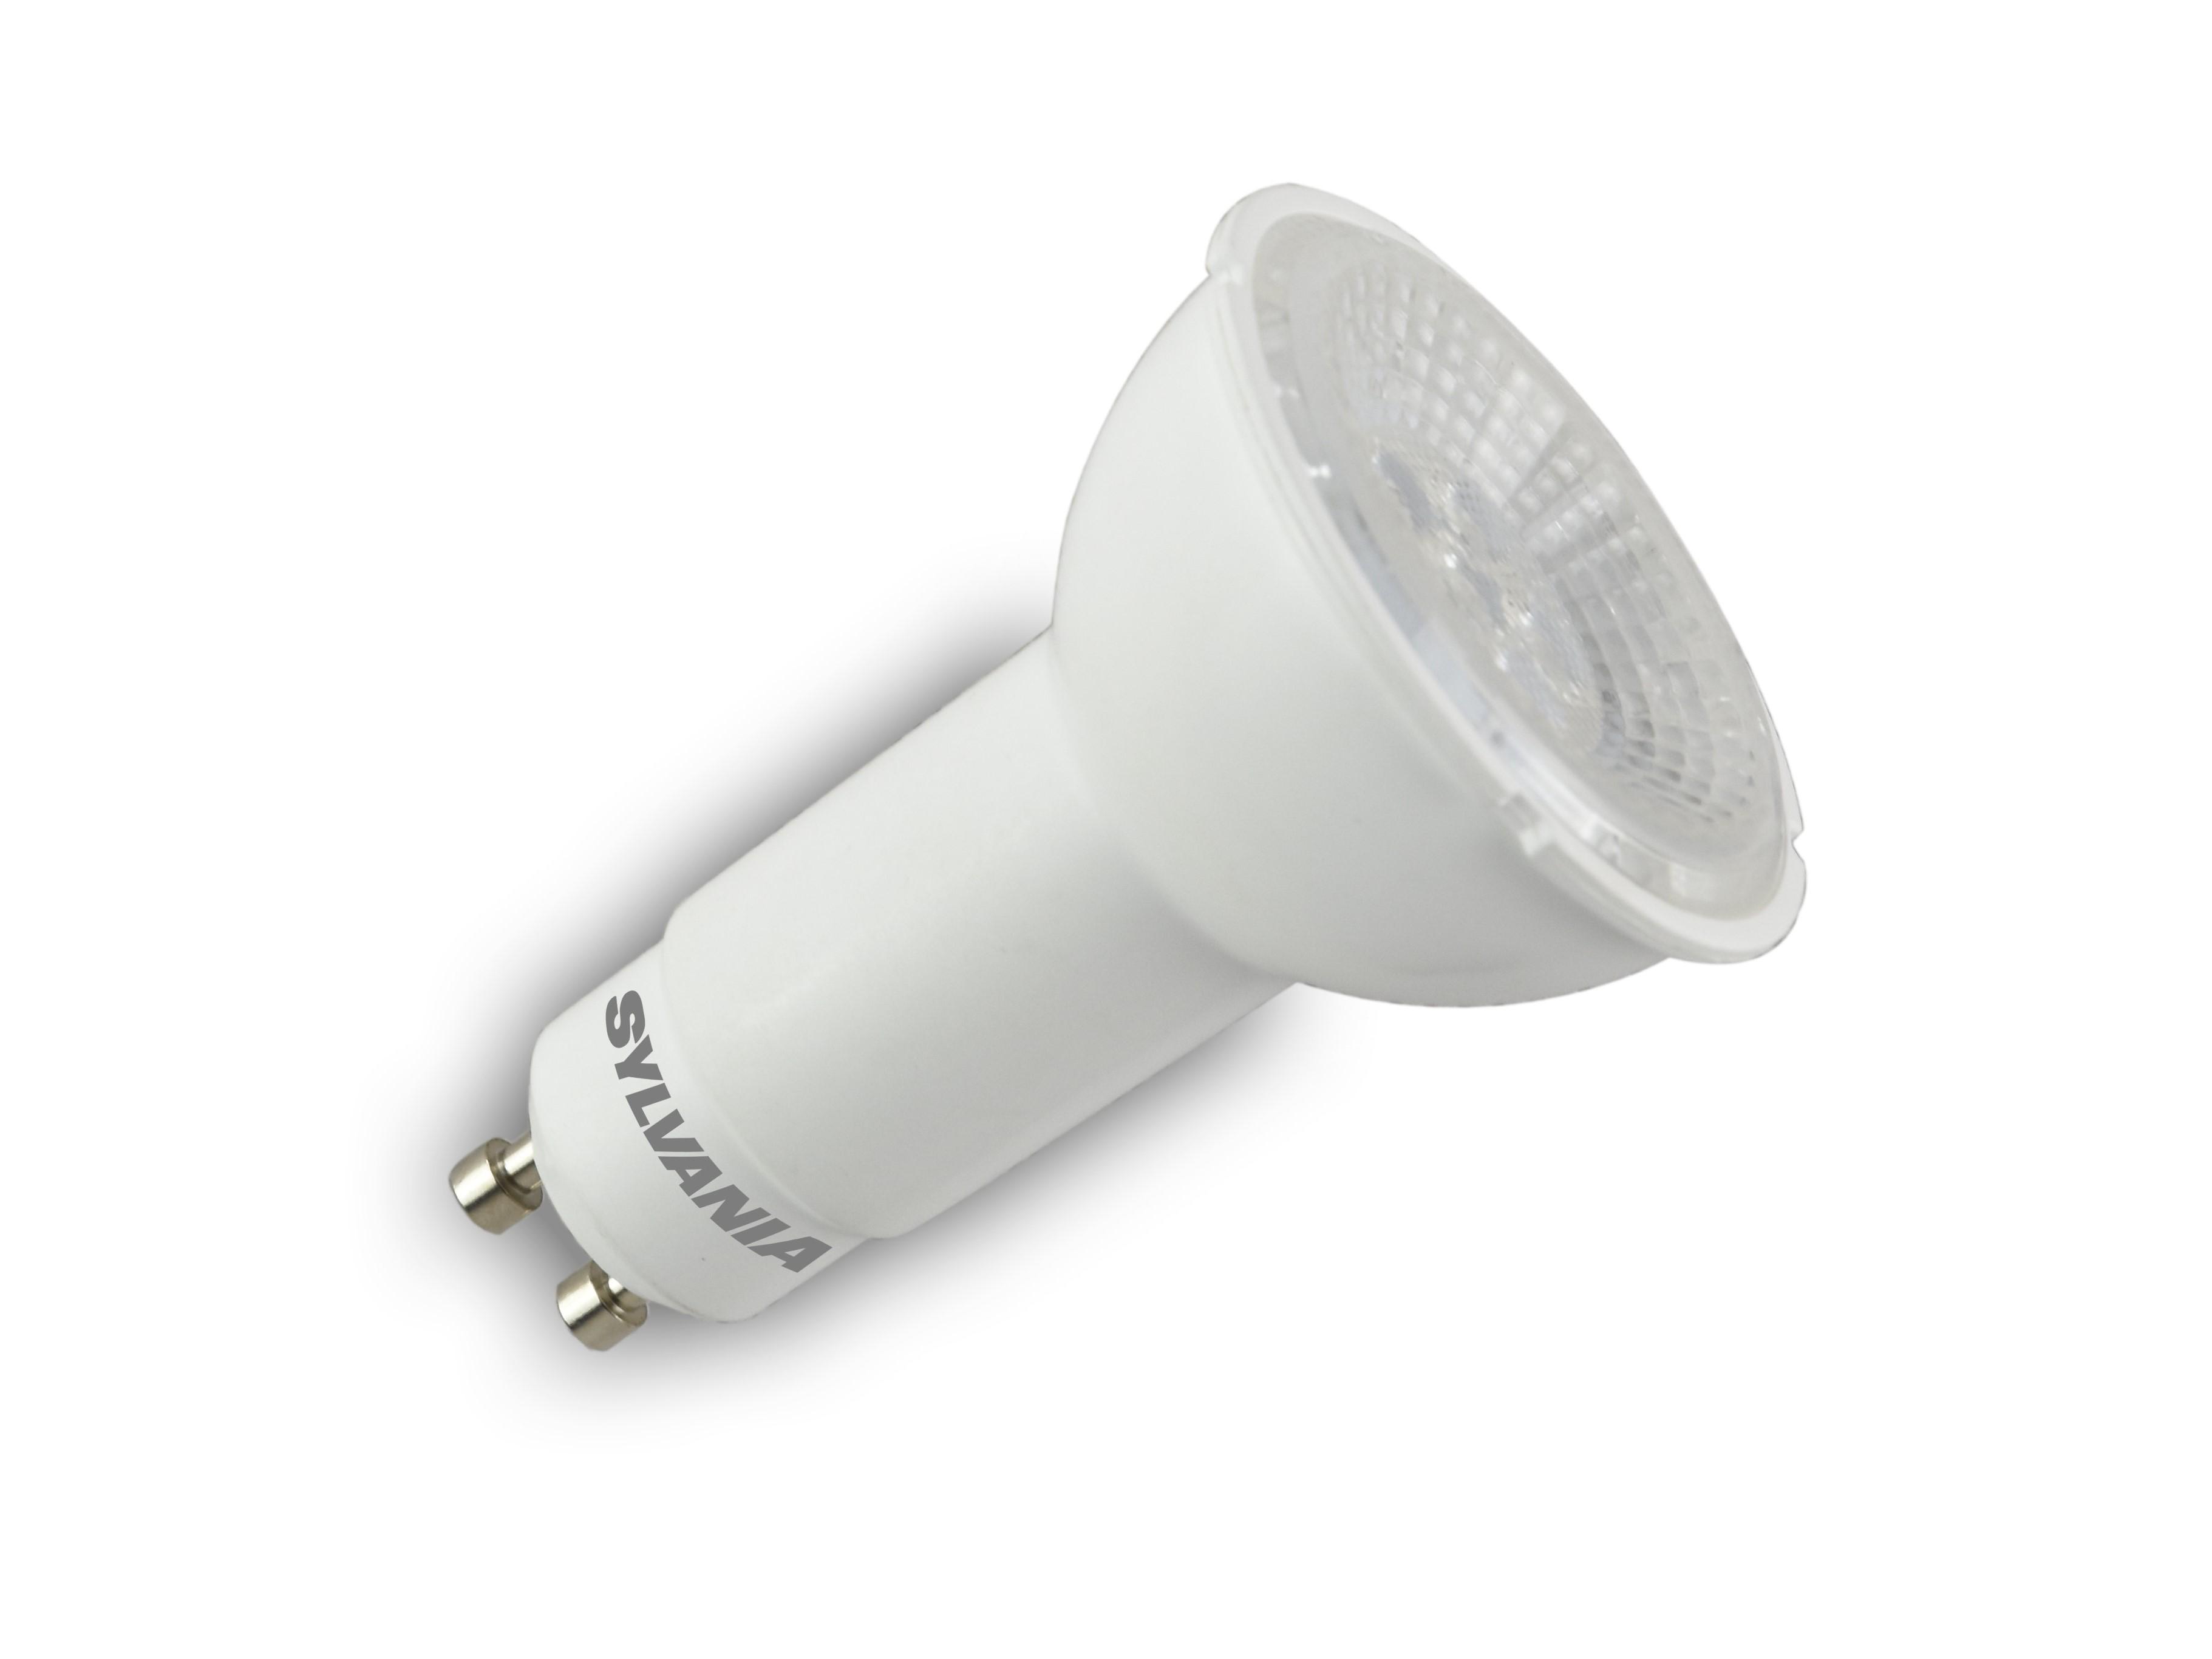 6x Sylvania RefLED dimmable 11.5W LED ES111 GU10 light bulbs replacing Hi-Spot